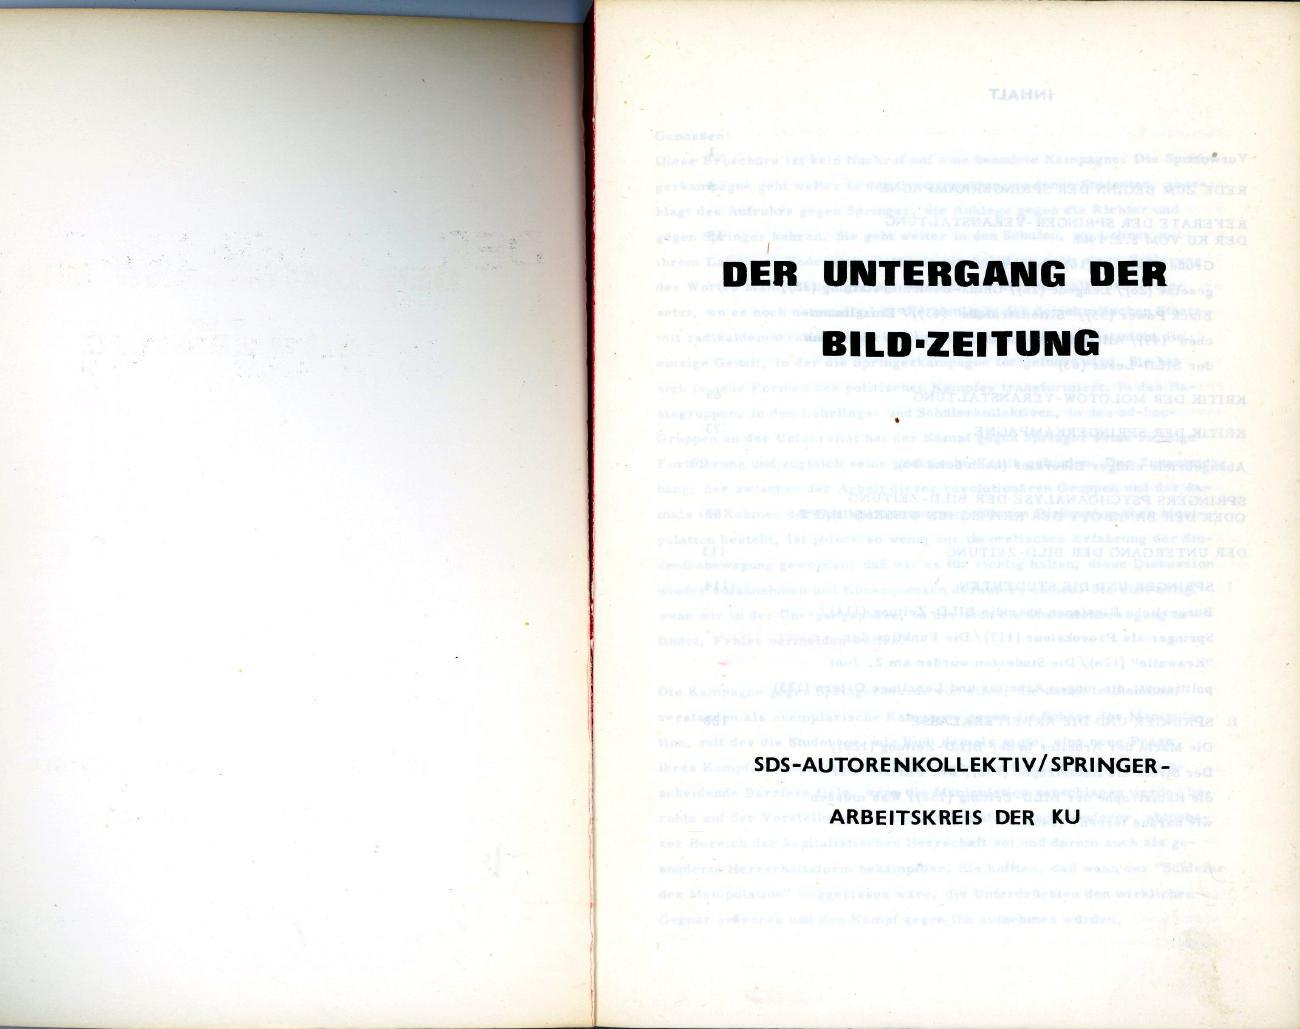 Berlin_SDS_1969_Bildzeitung_02